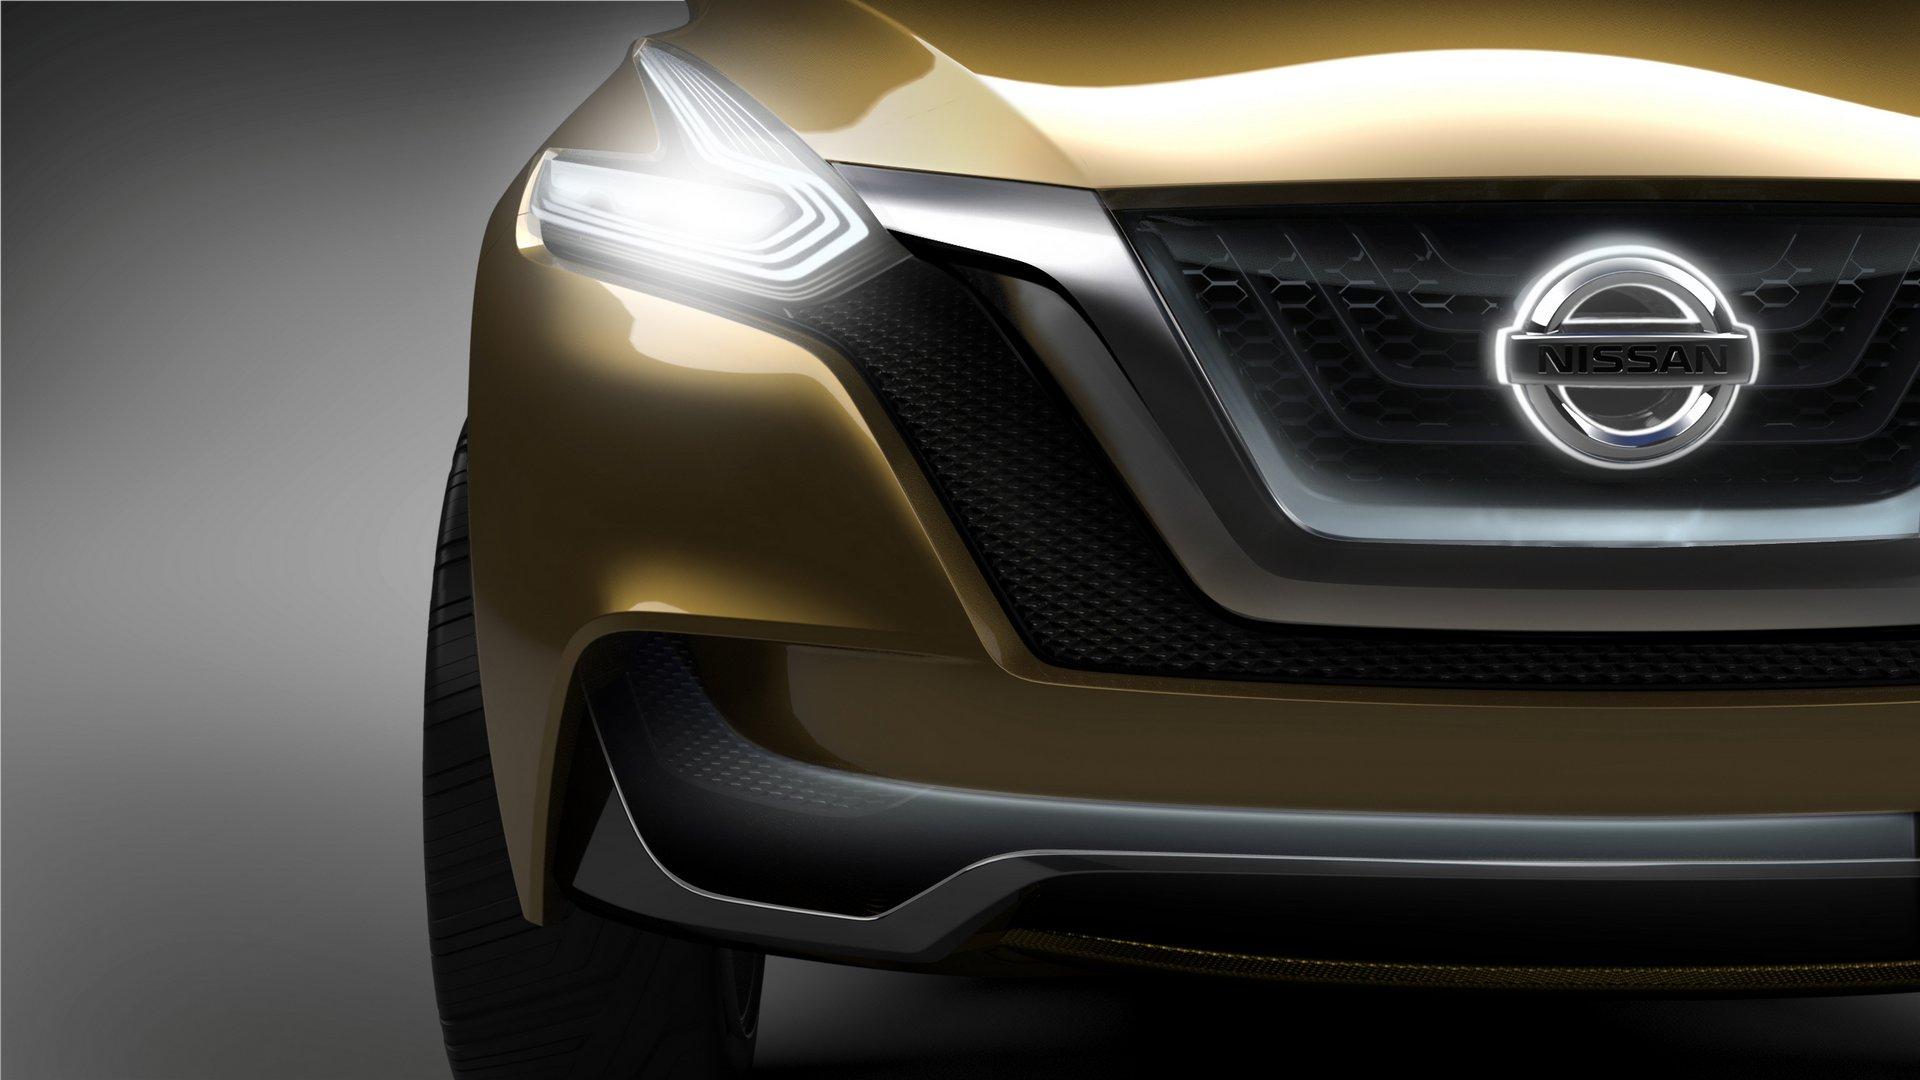 Nissan Cars - News: Resonance Concept hints at future SUV